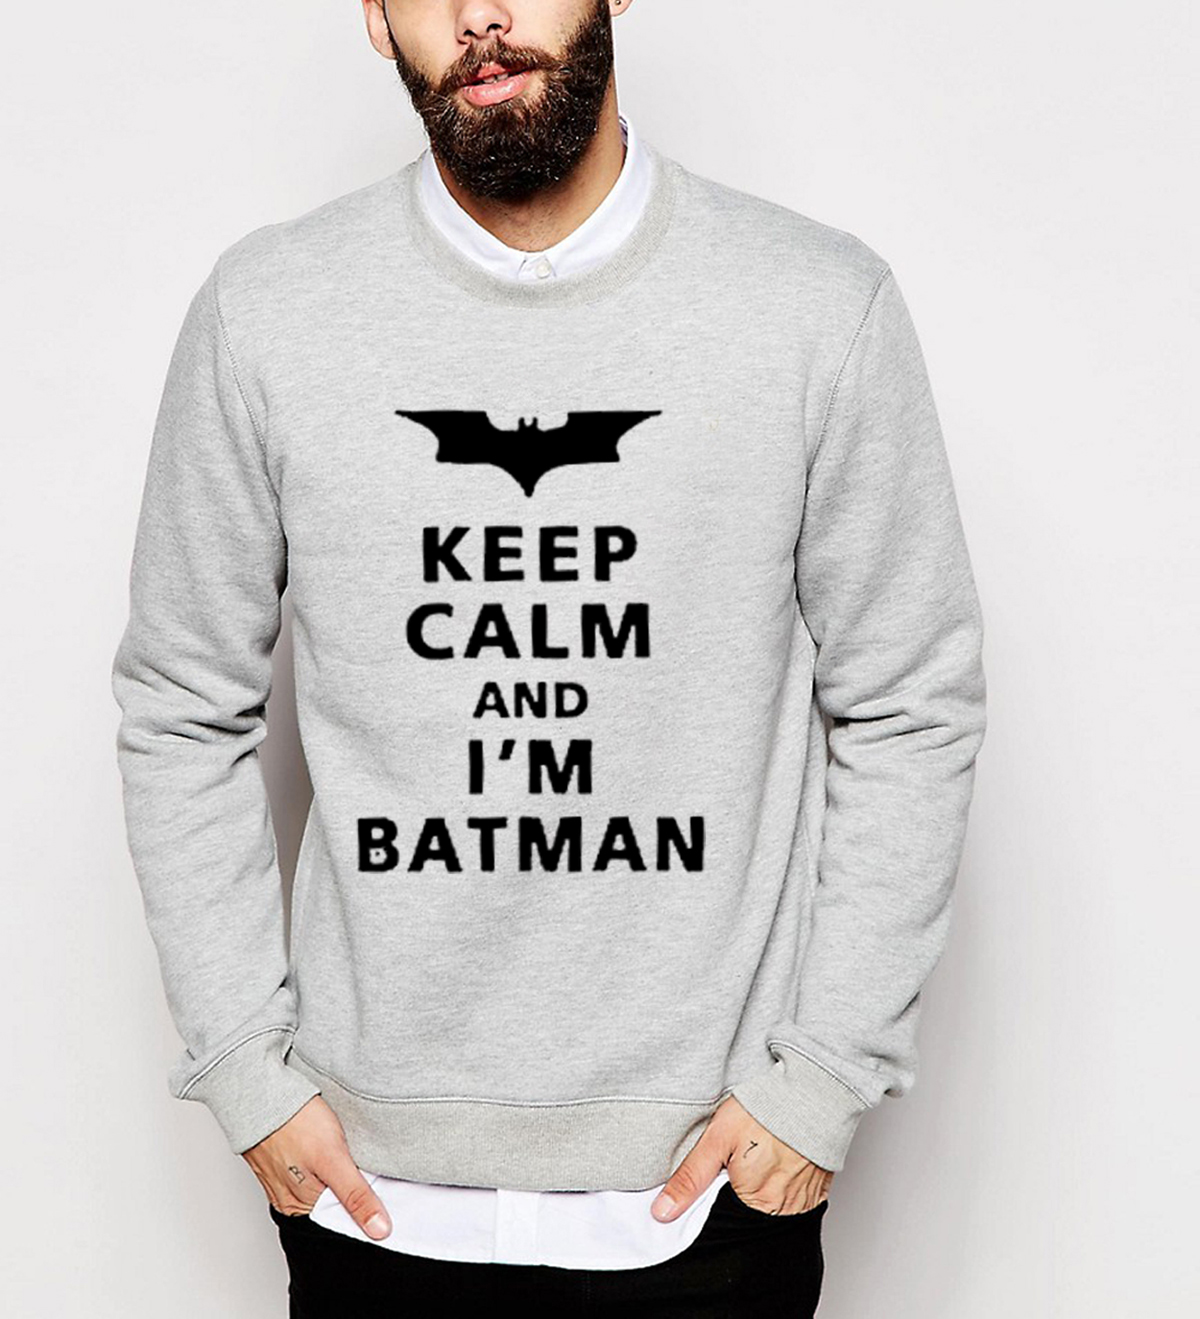 men hipster  sweatshirts 2019 autumn winter hoodies hip-hop I Am  fleece tracksuits hip hop streetwear pullovers